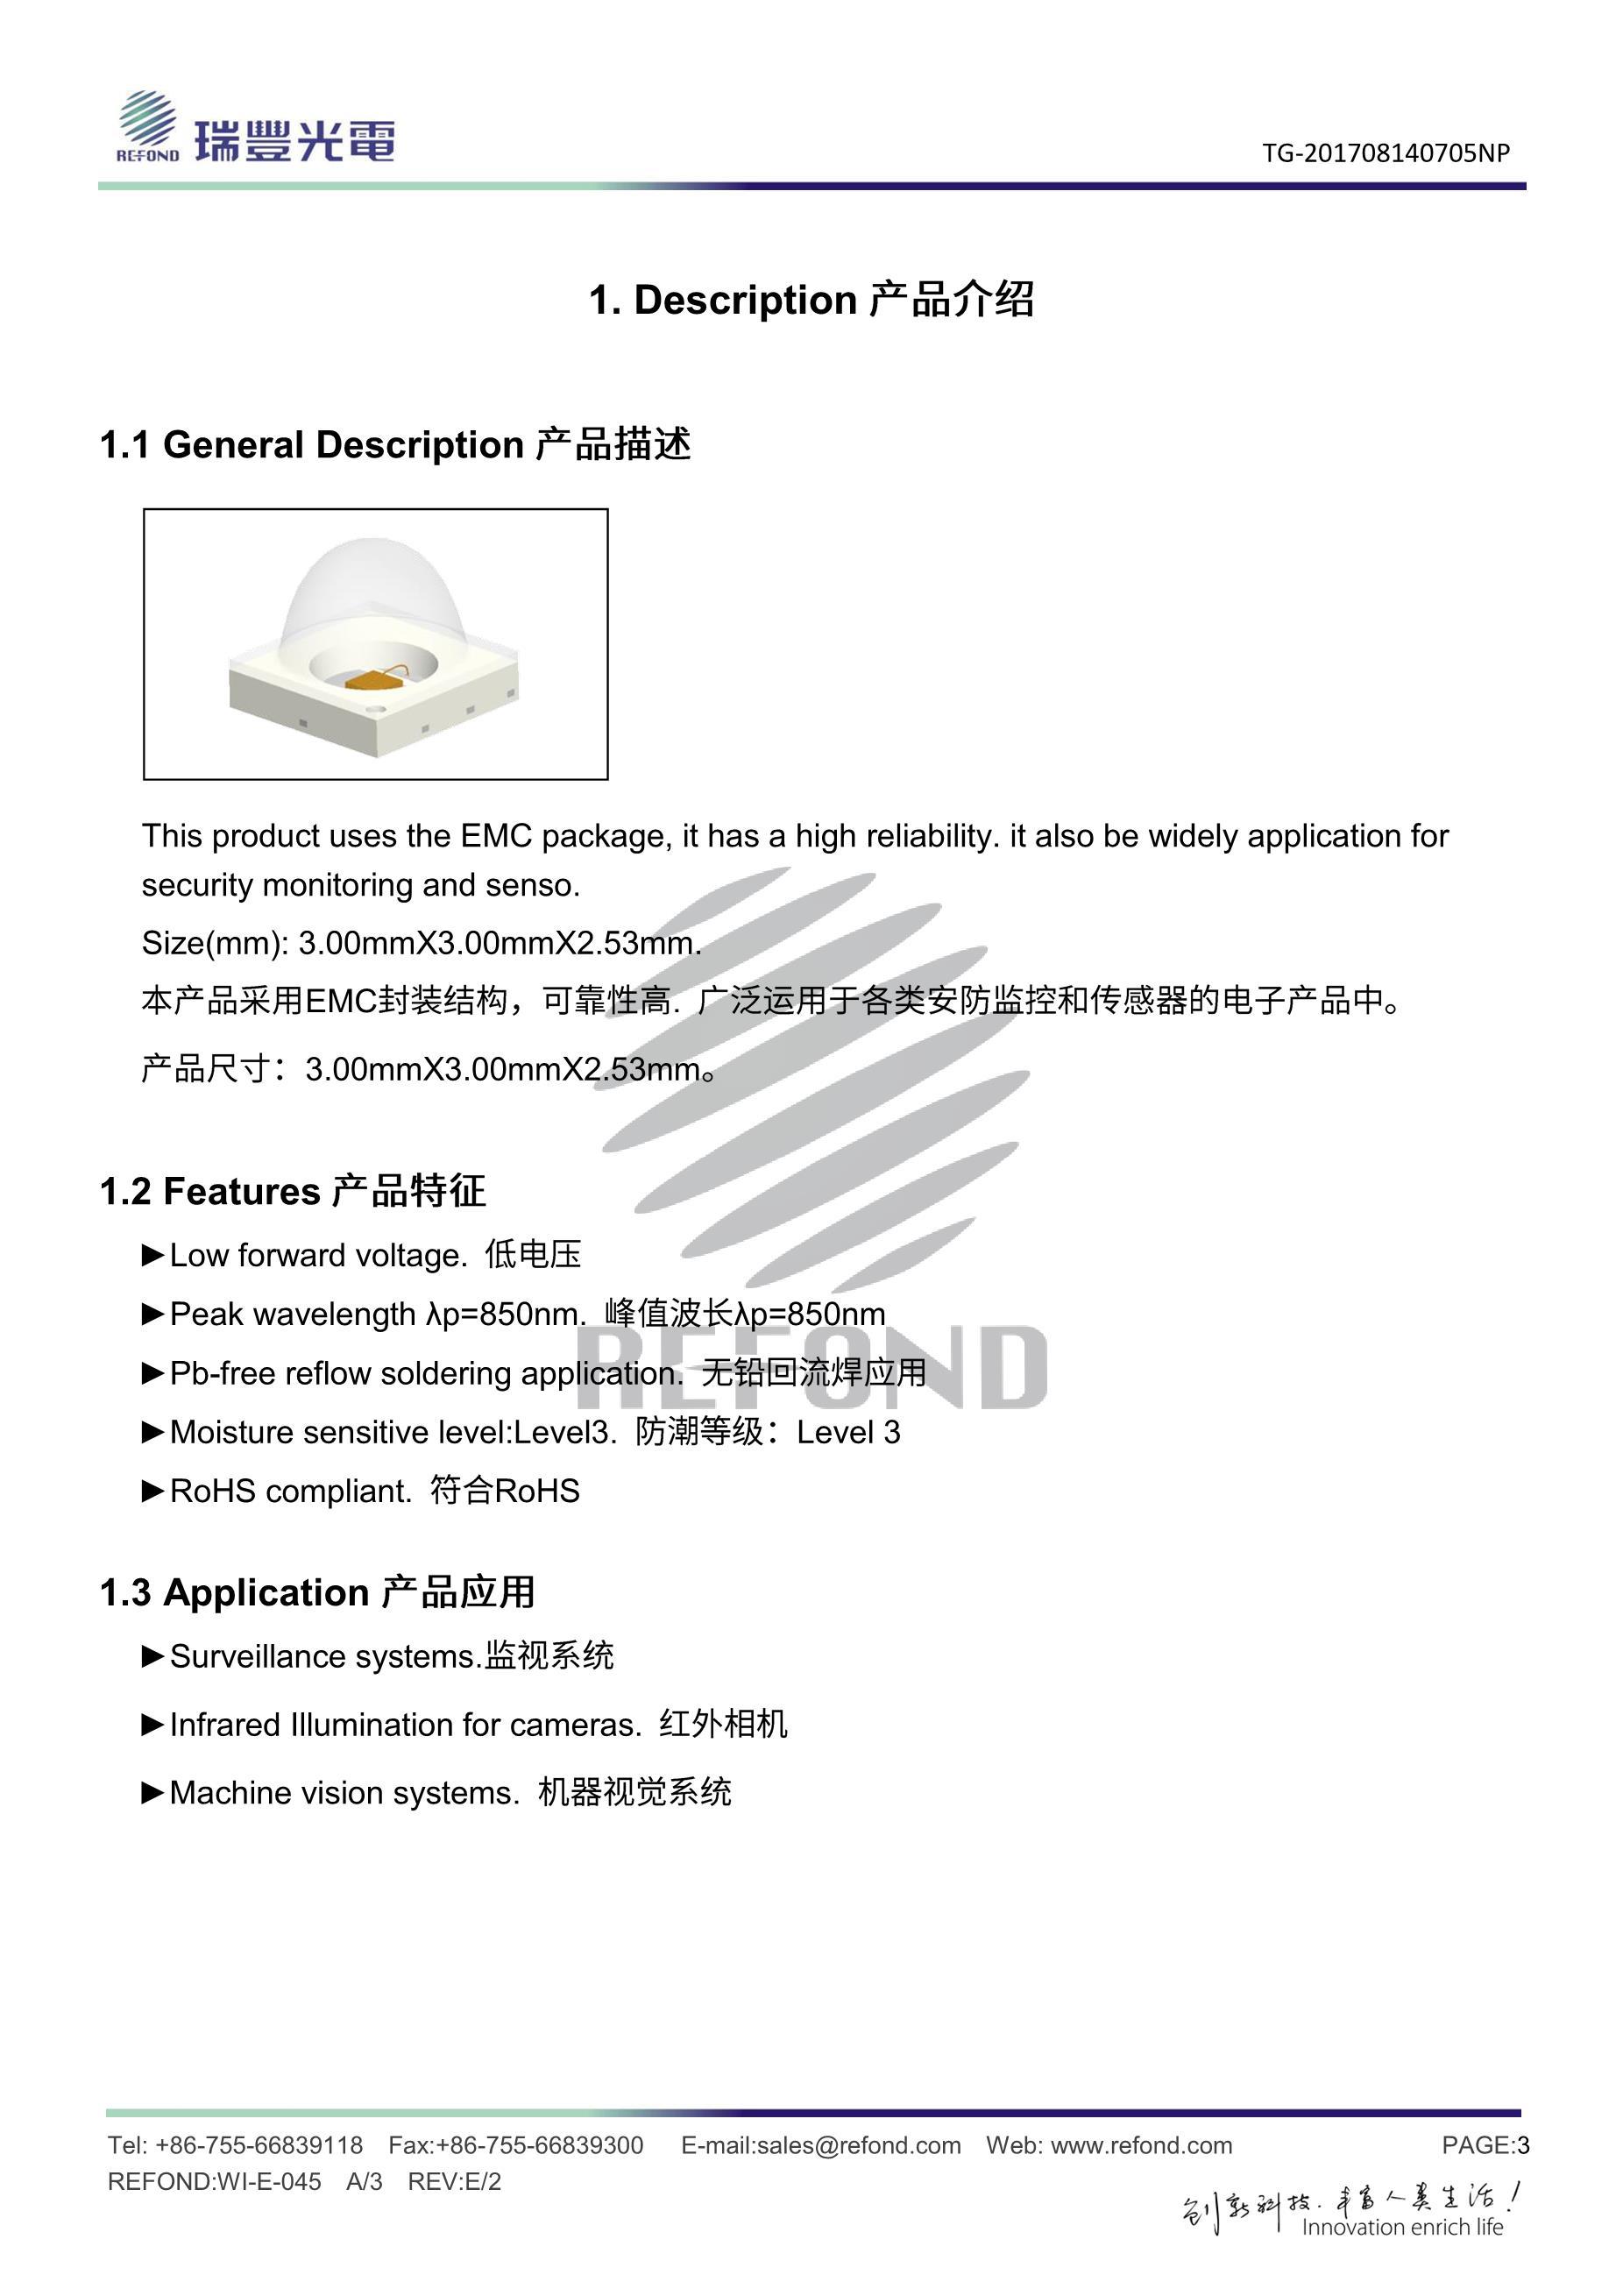 1.8V converter seat SPI Flash memory SOP8 DIP8 converter plate motherboard MX25 W25 1.8V converter board's pdf picture 3